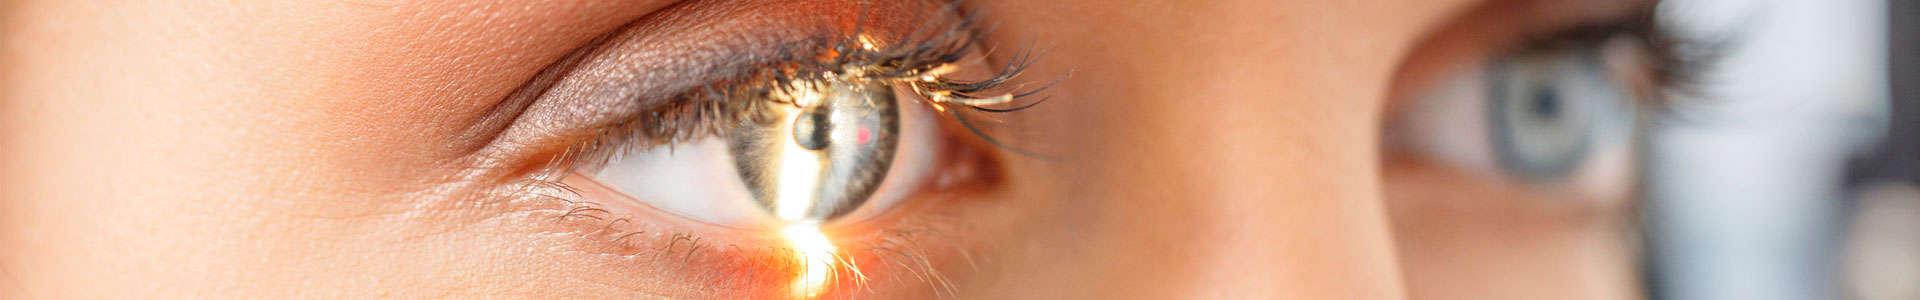 intervento-astigmatismo